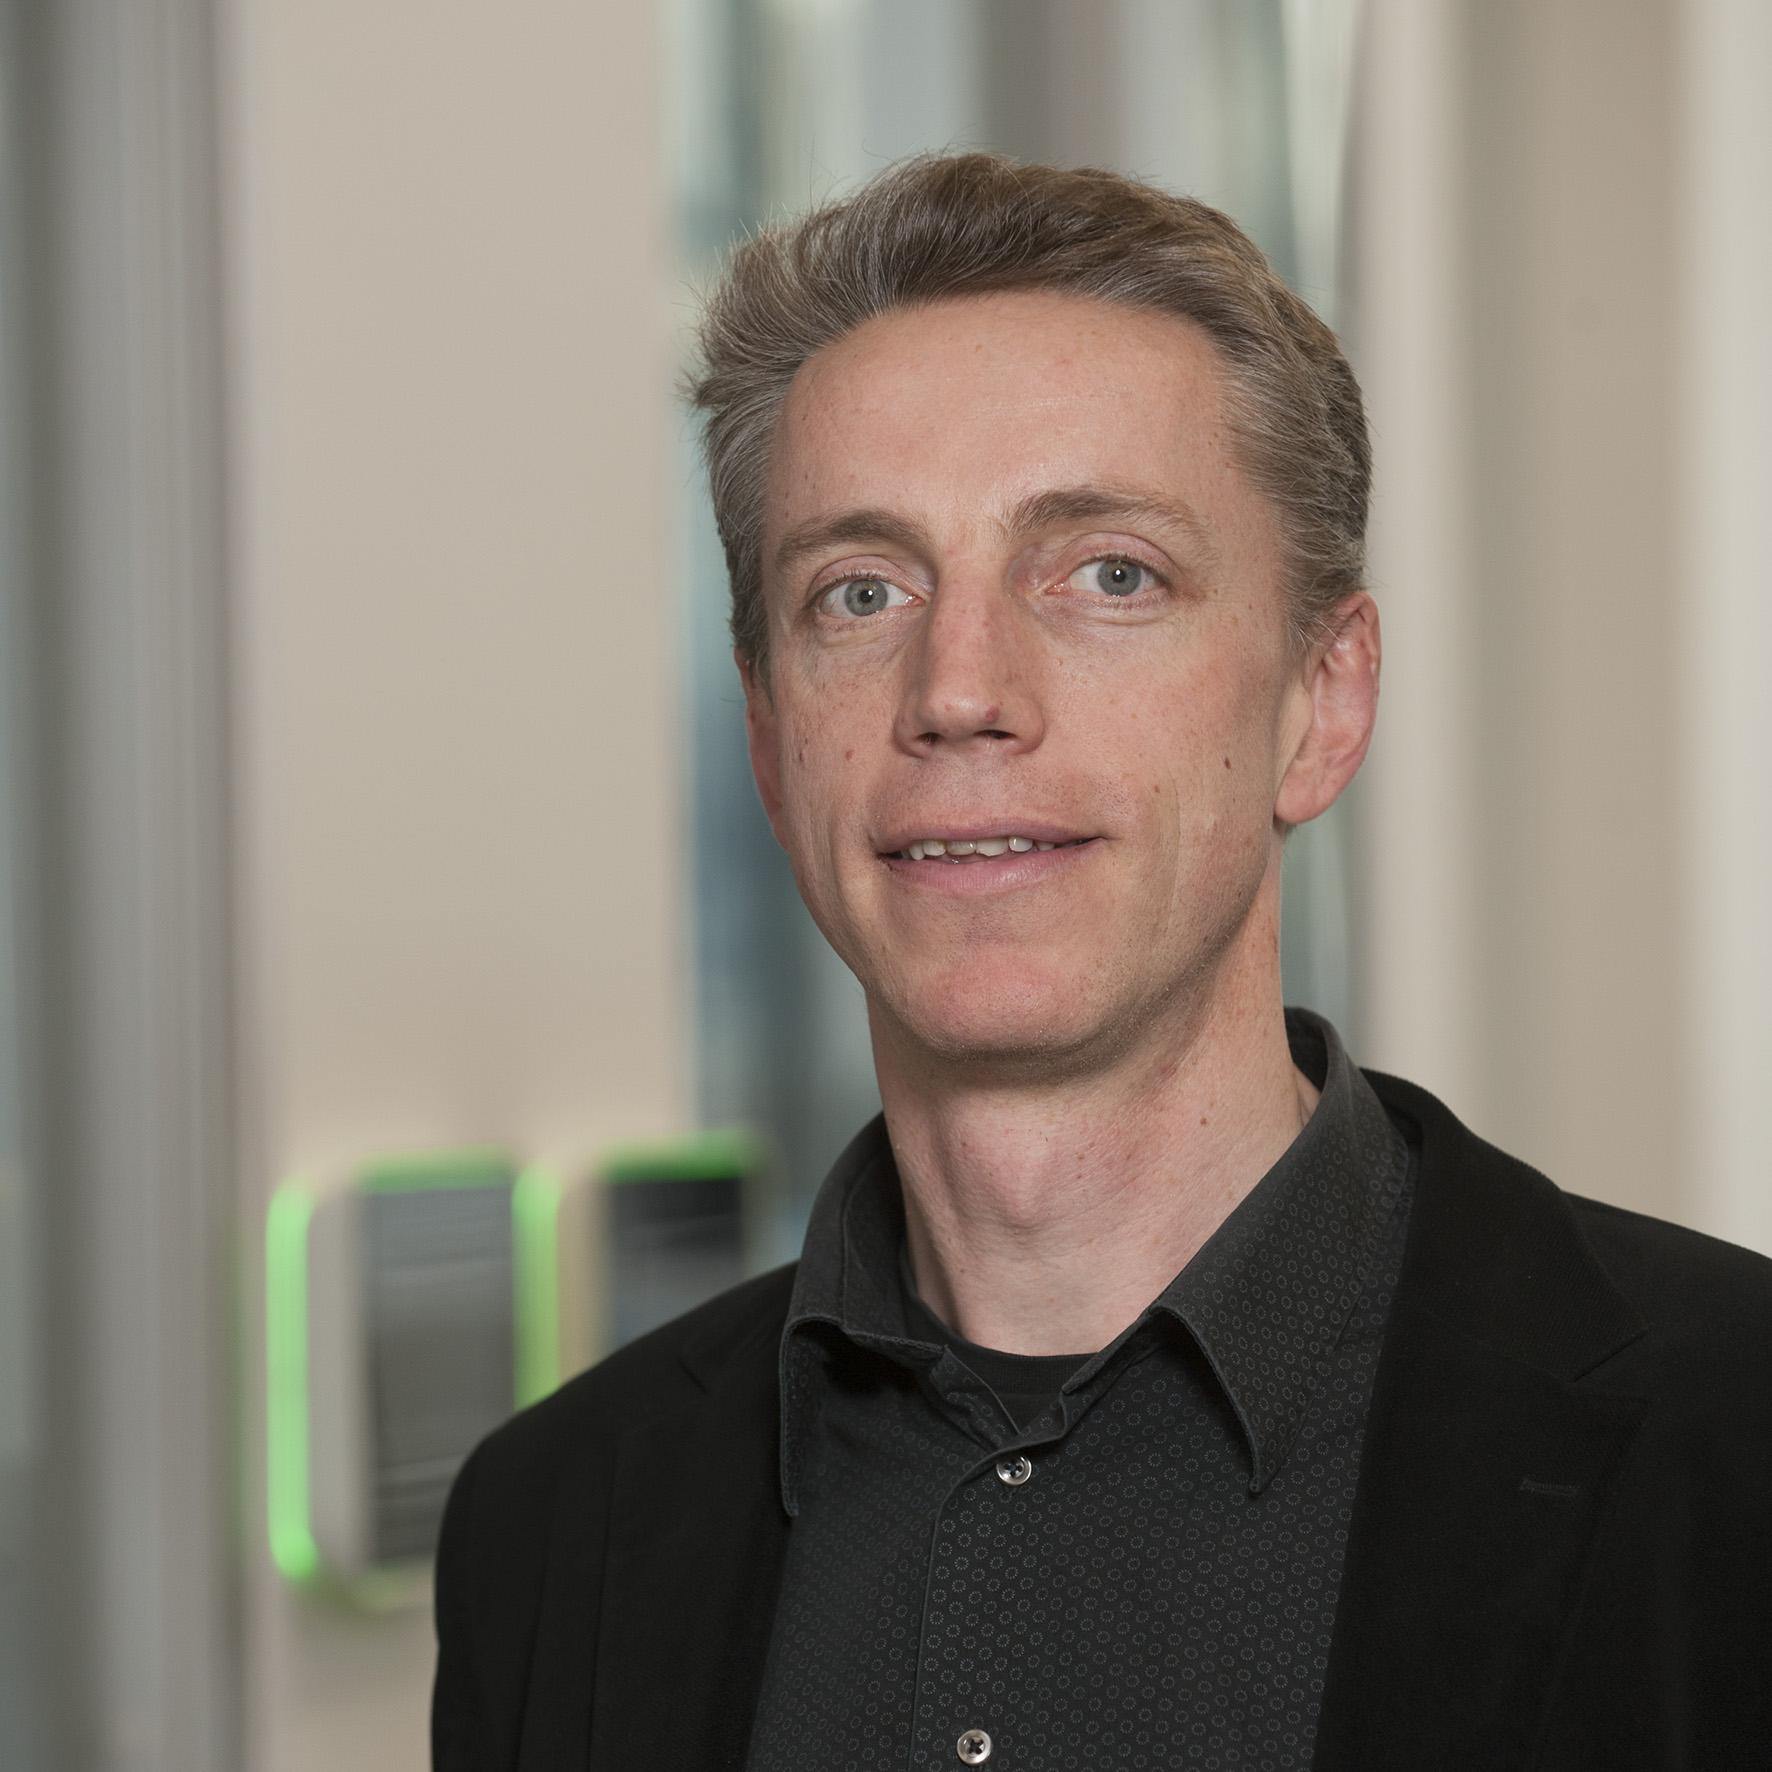 Dr. David Lewin - Senior Lecturer in Philosophy of Education, Strathclyde University